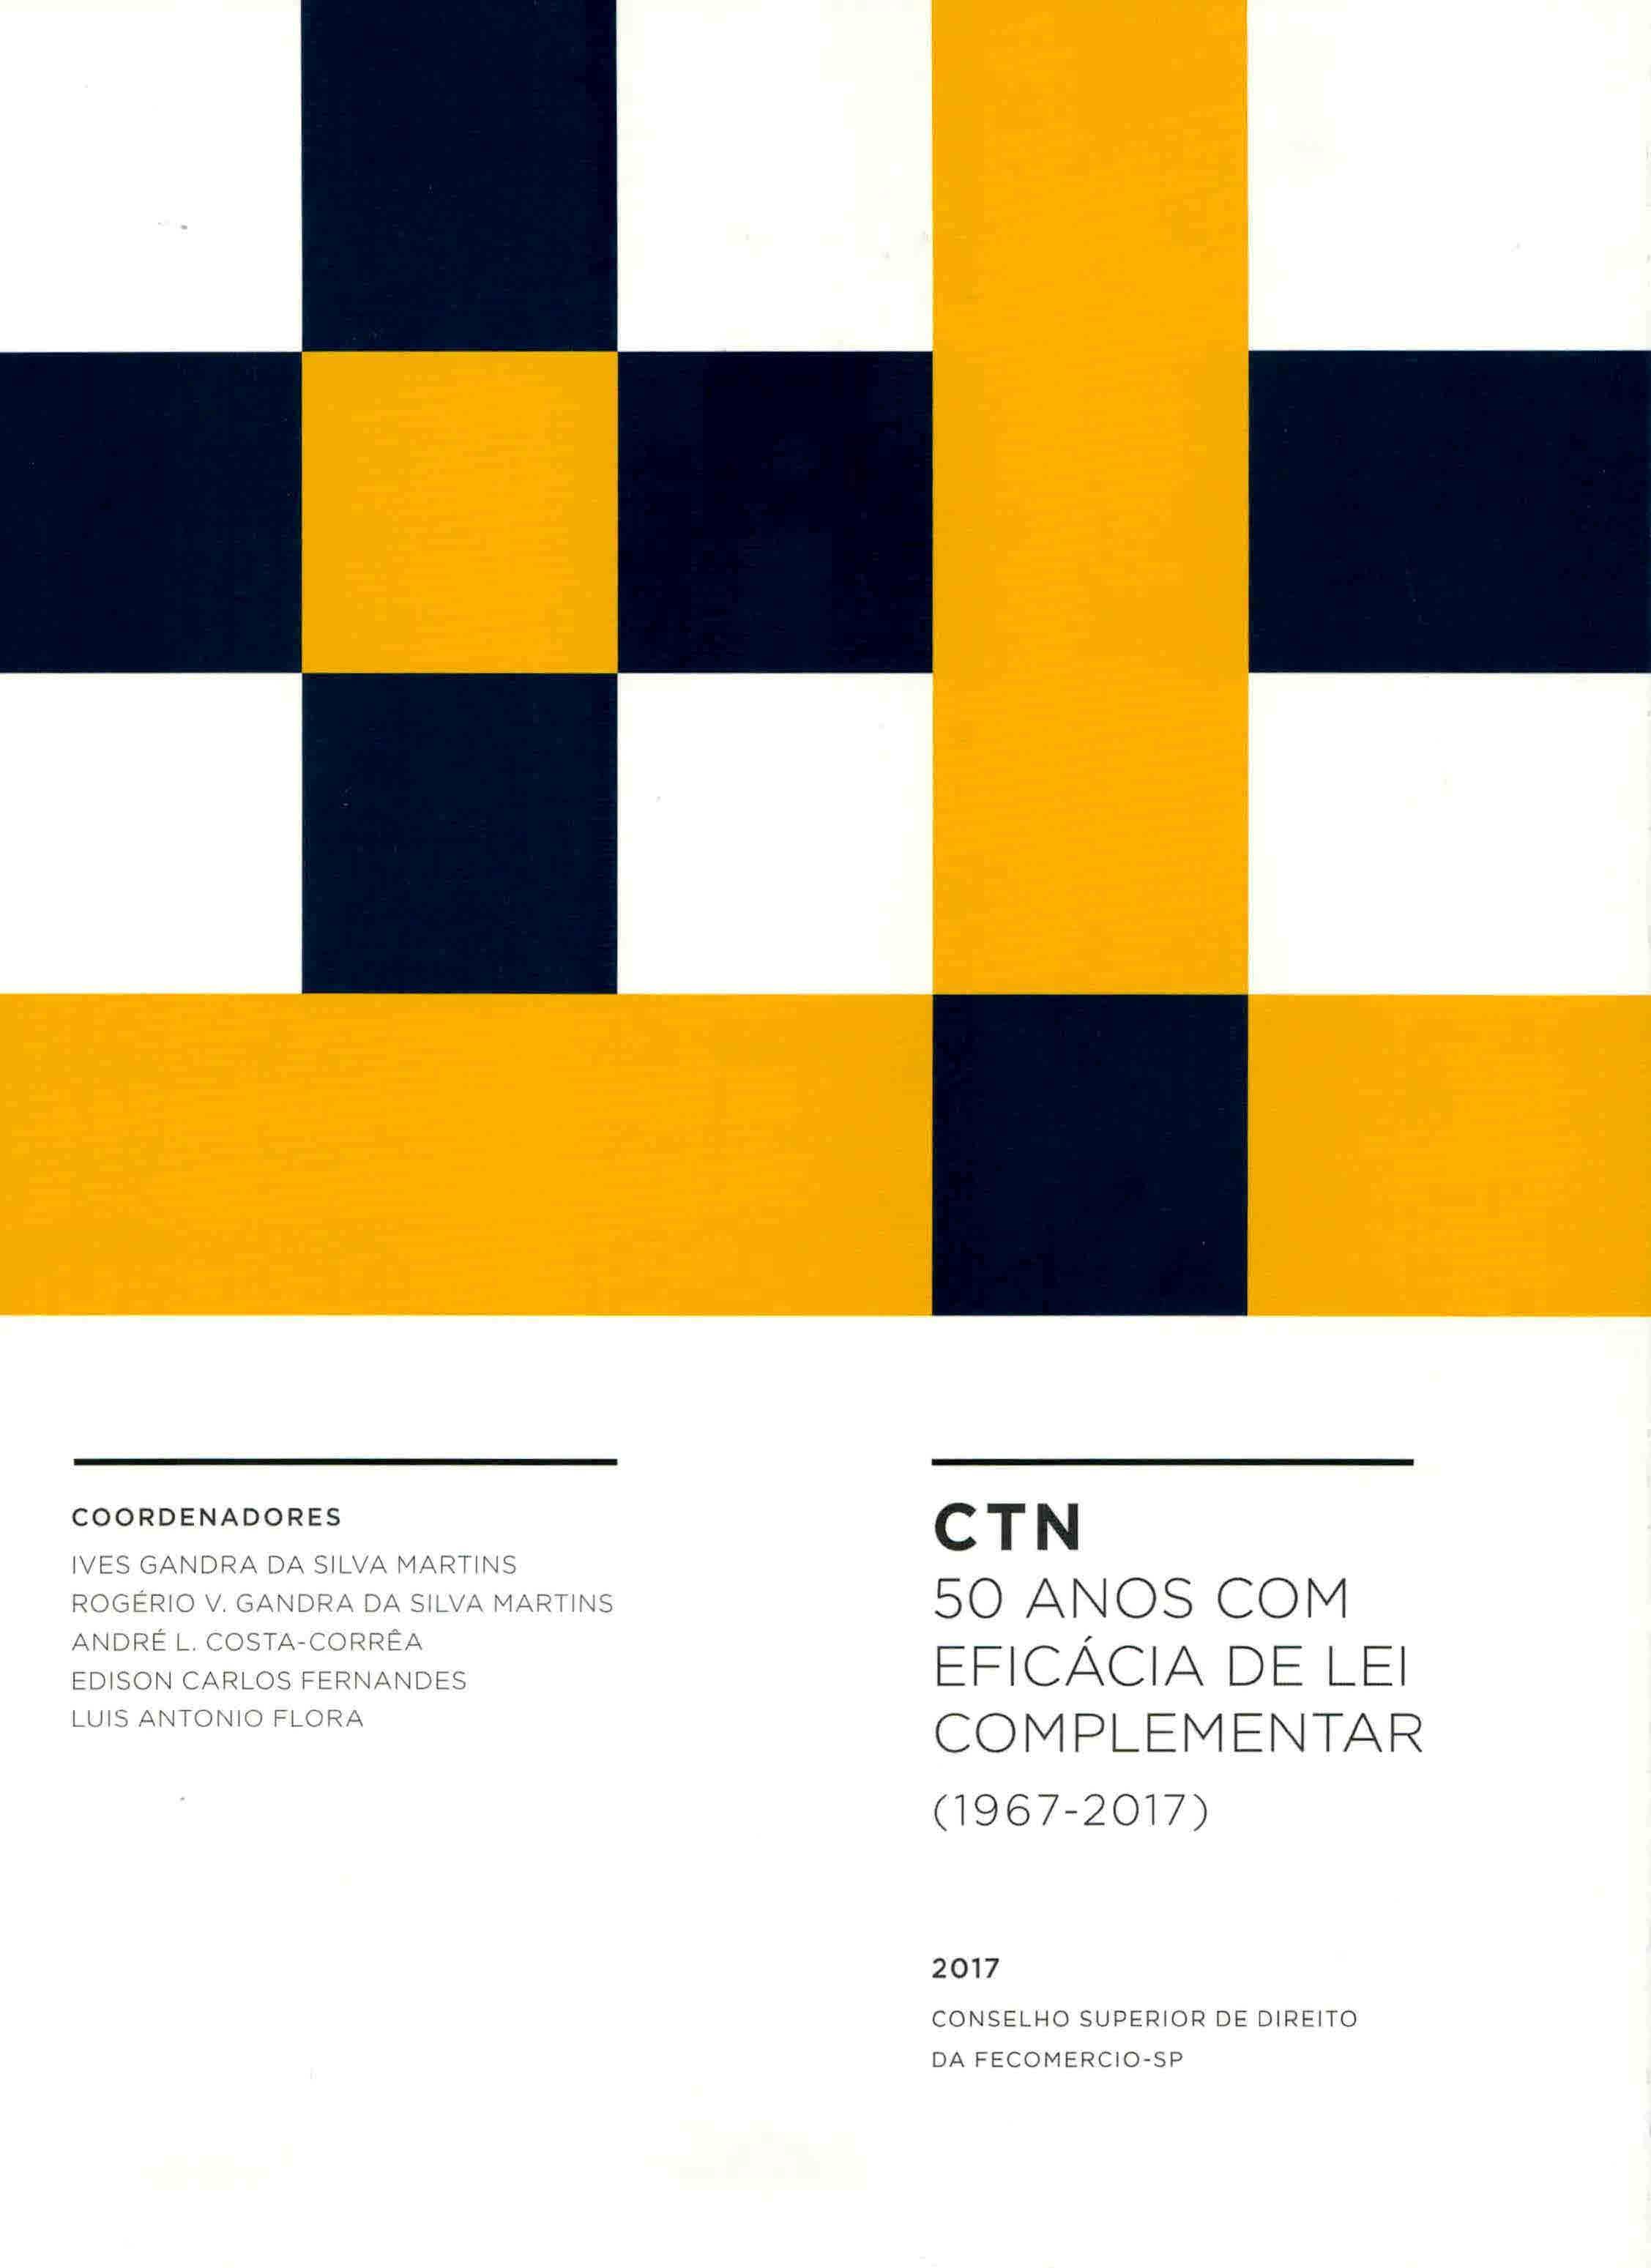 CTN 50 anos com eficácia de Lei Complementar: 1967-2017